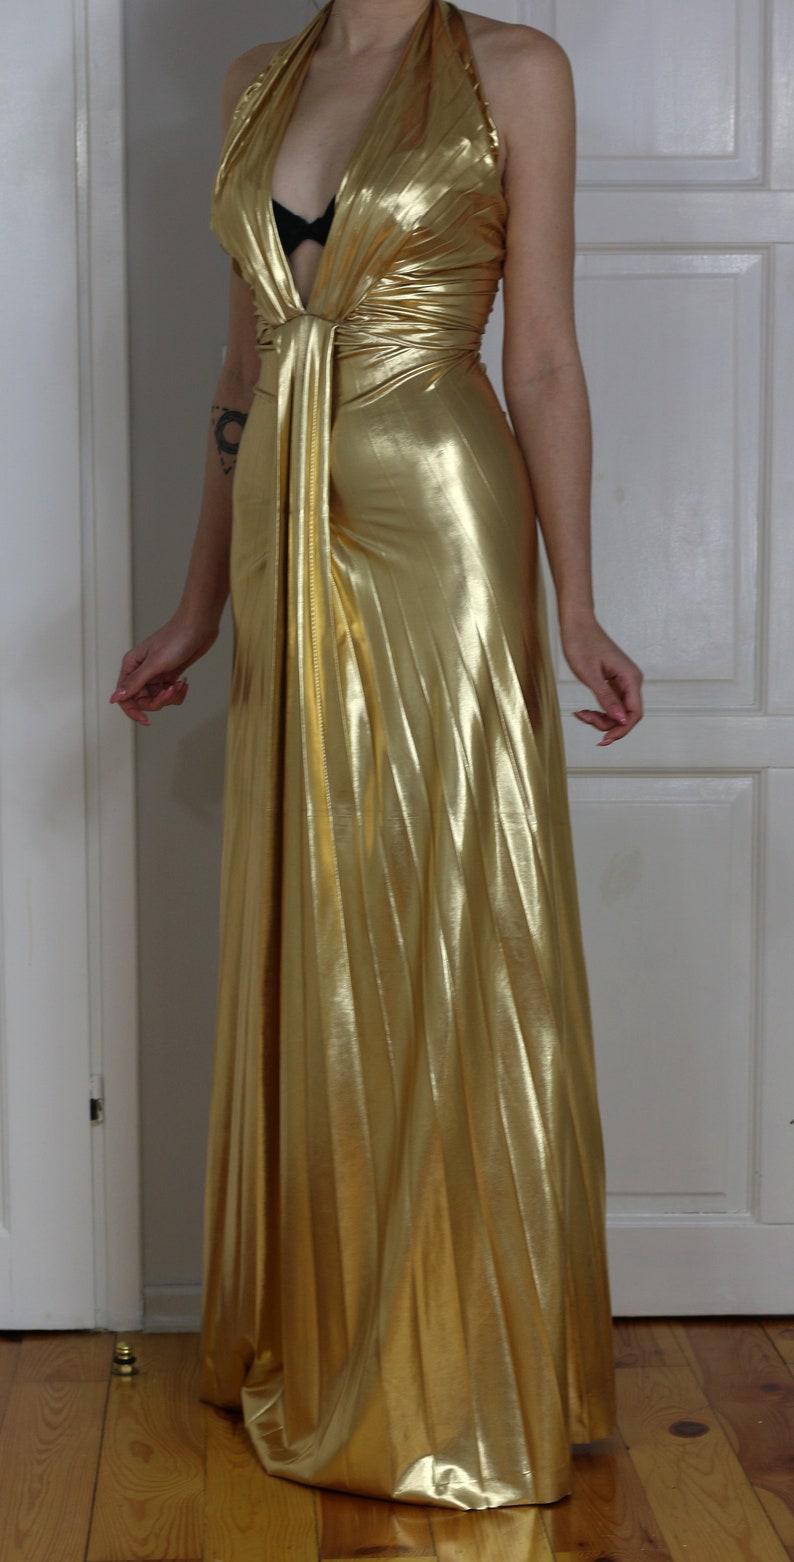 40006743654f0 Men Prefer Blondes Gold Dress gown replica Marilyn Monroe